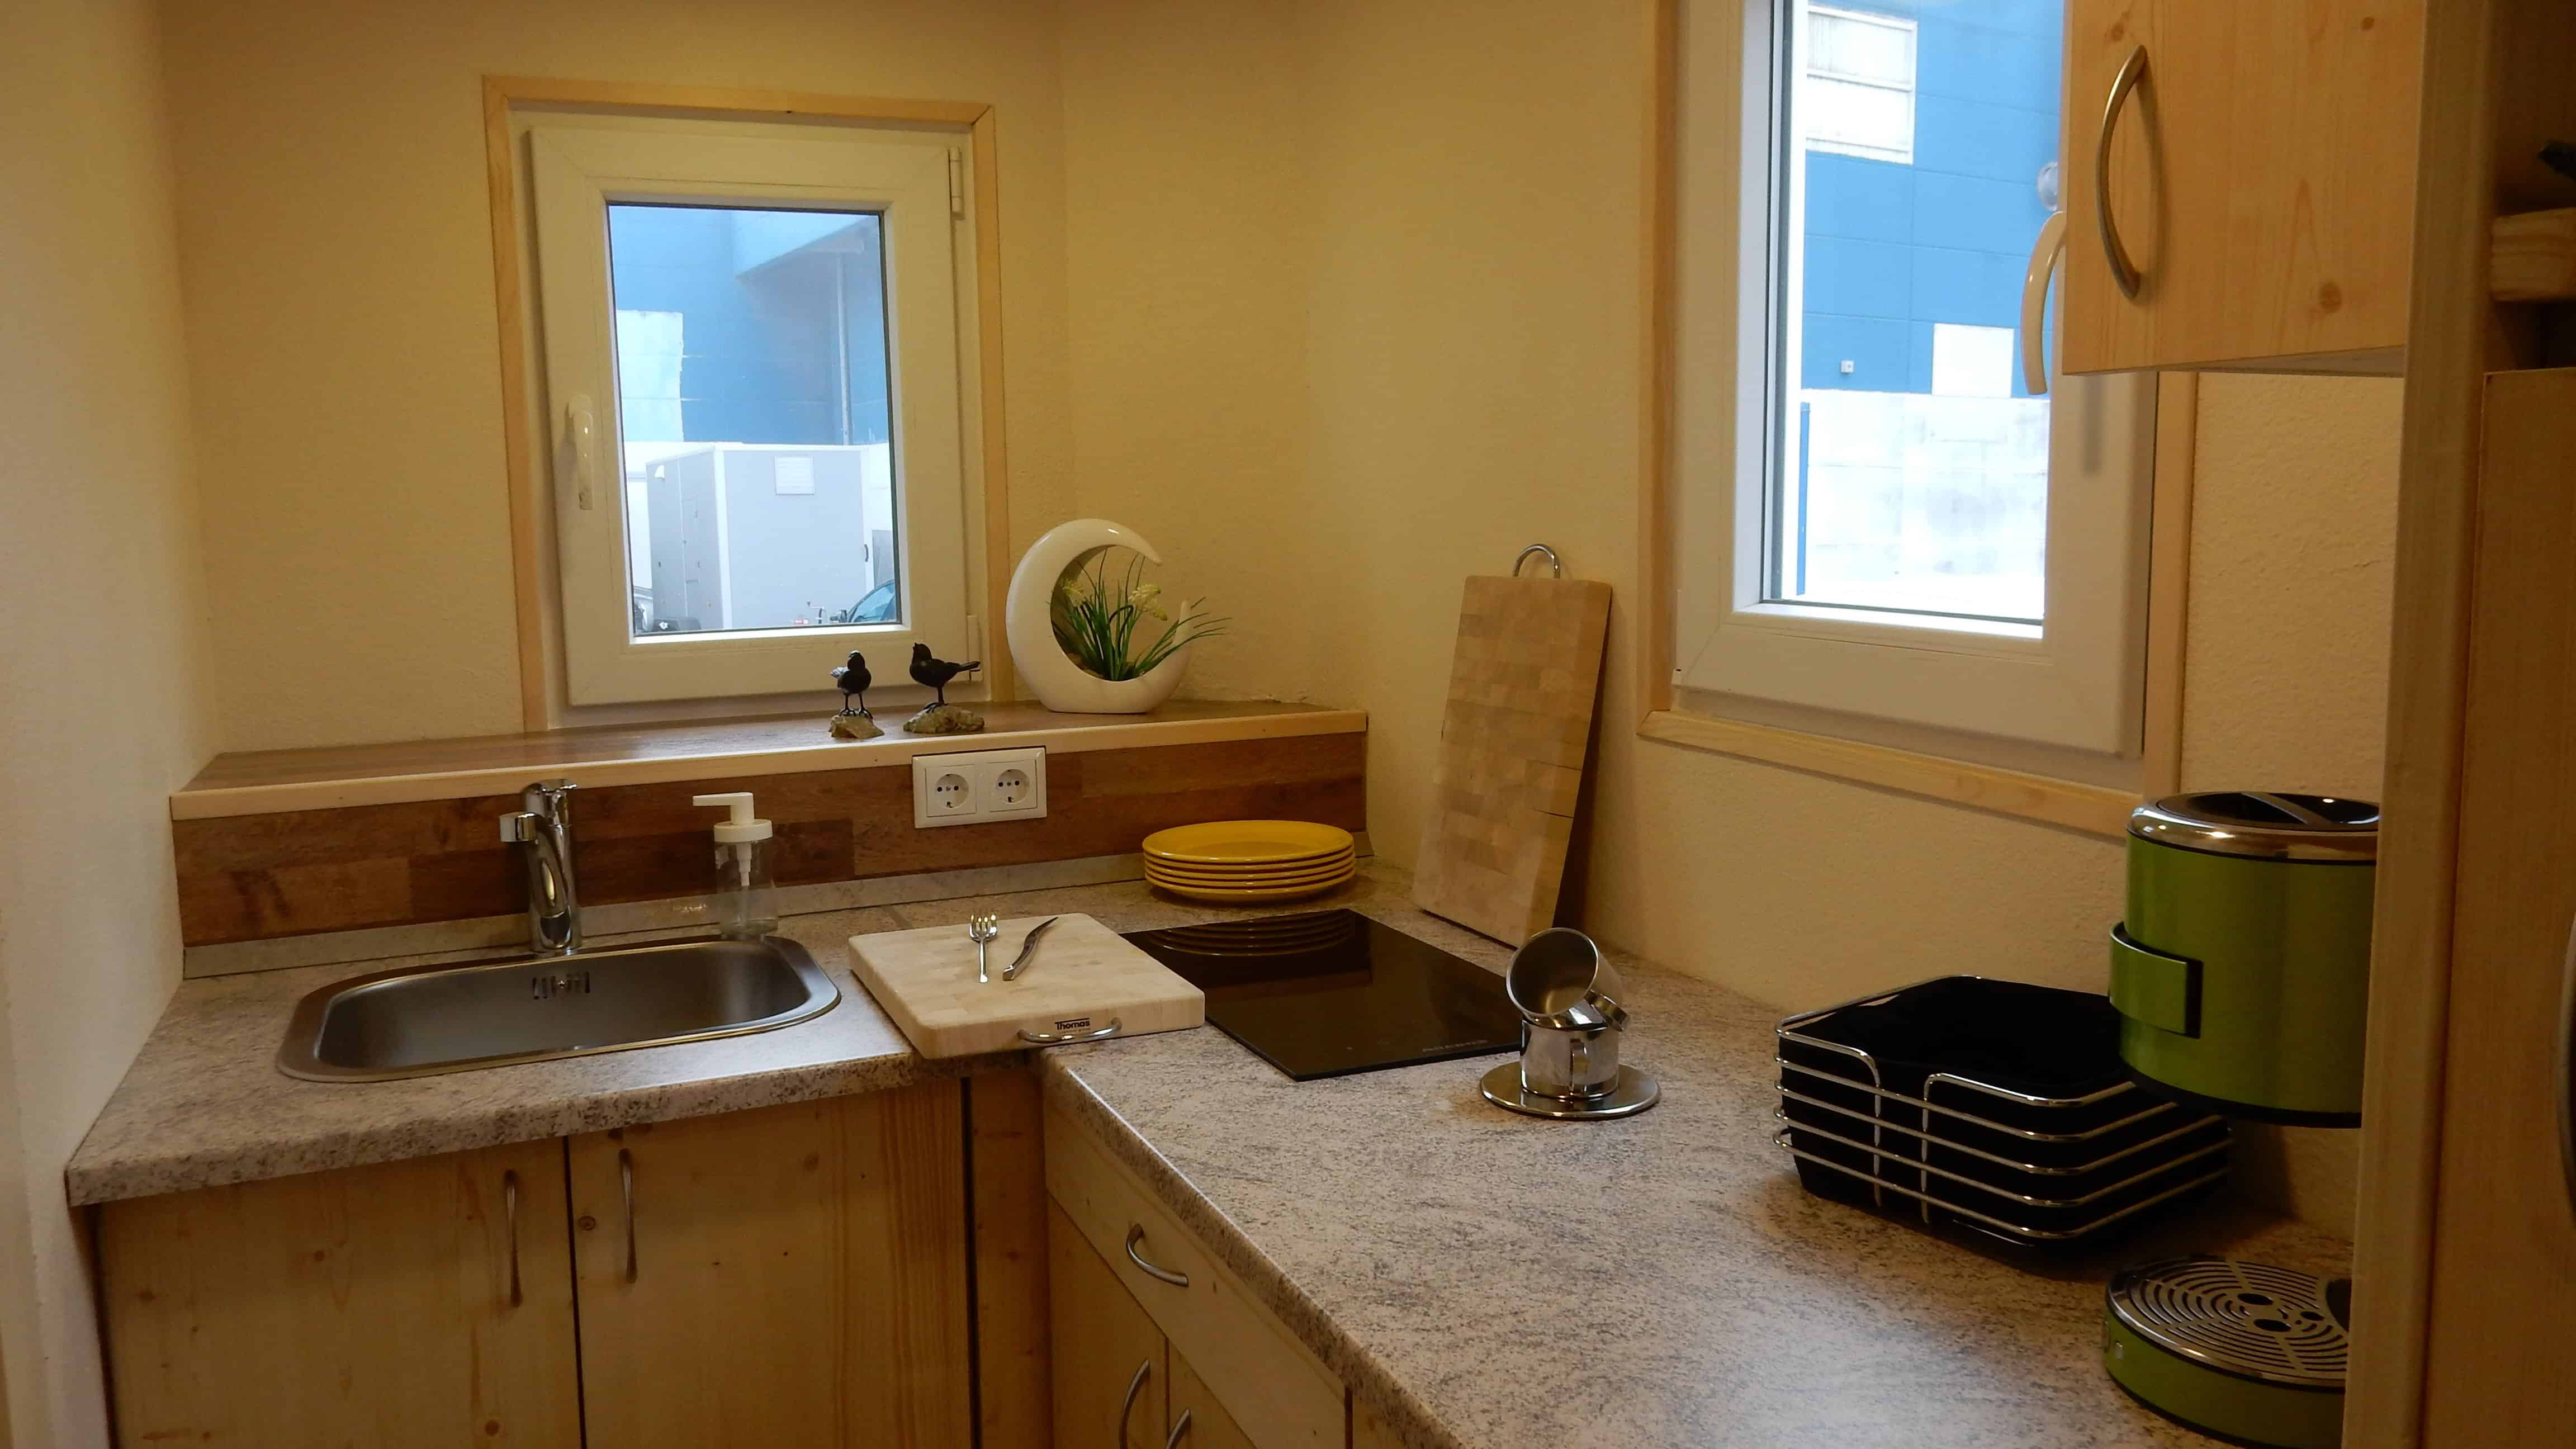 rth 171125 22 immofux com immobilien portal. Black Bedroom Furniture Sets. Home Design Ideas